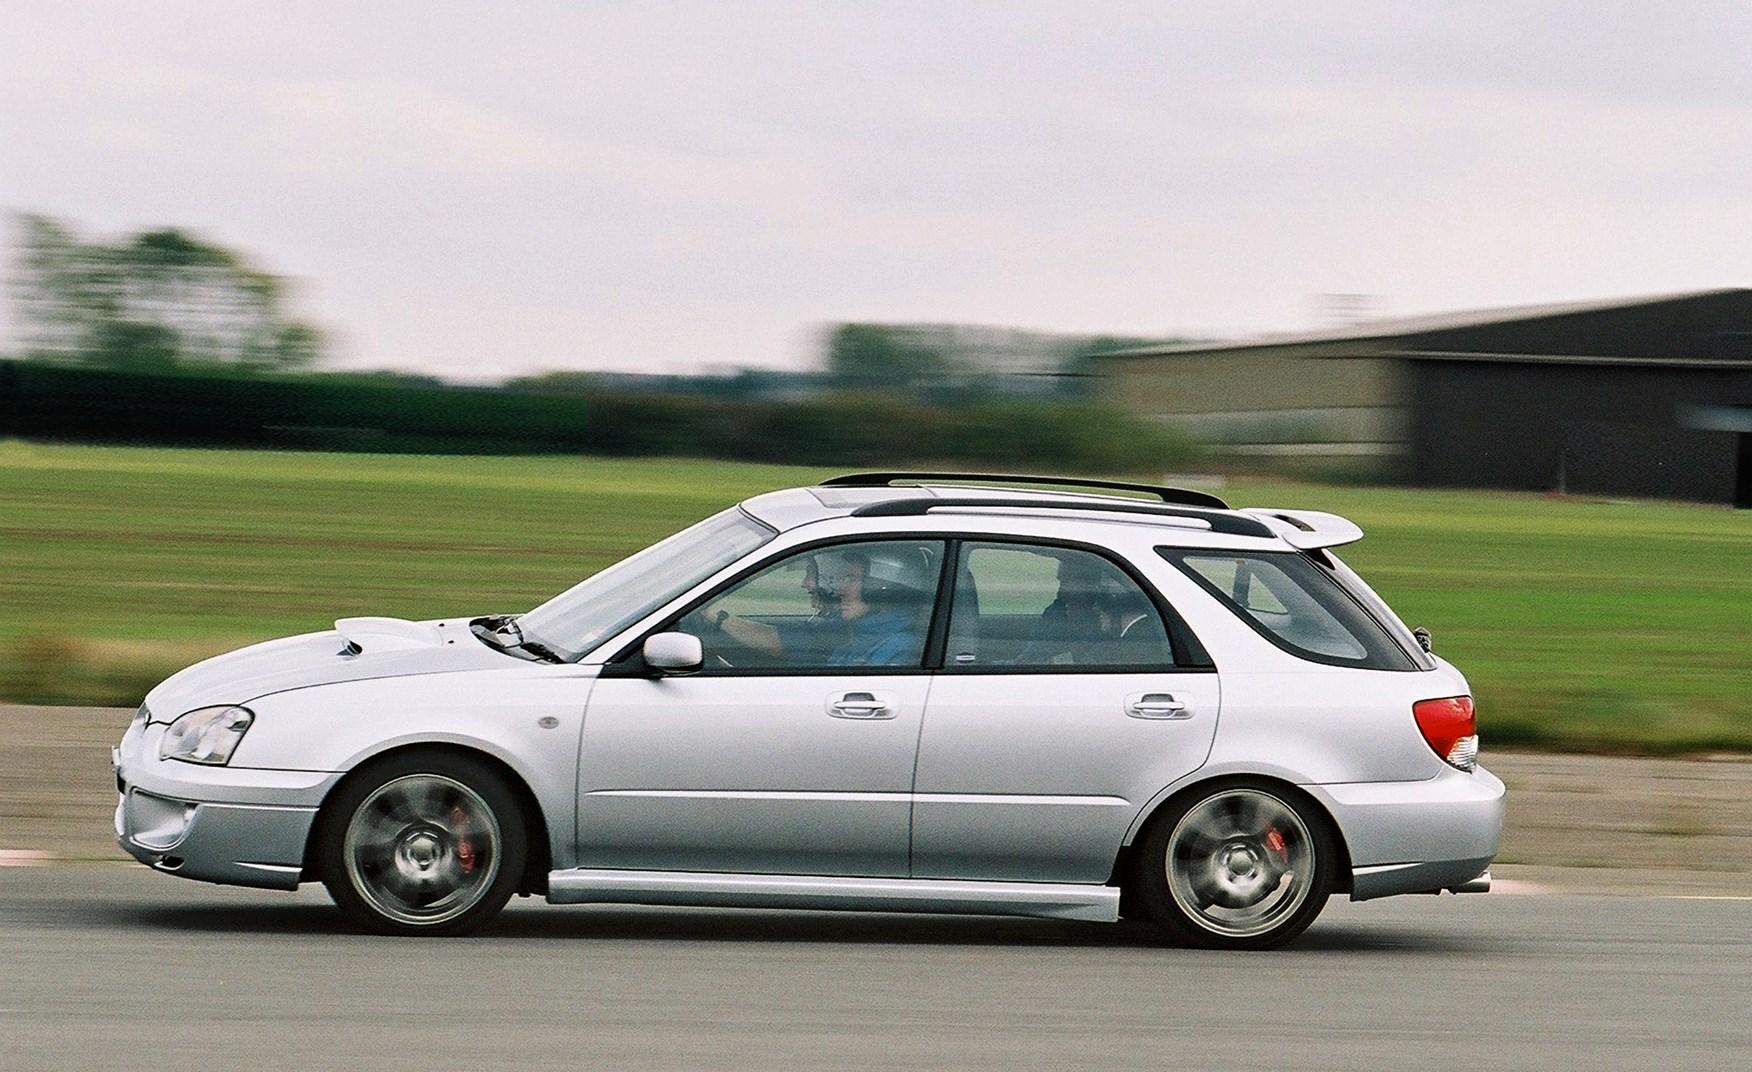 2005 Subaru Impreza Wrx And Sti Spec Page Autos Post